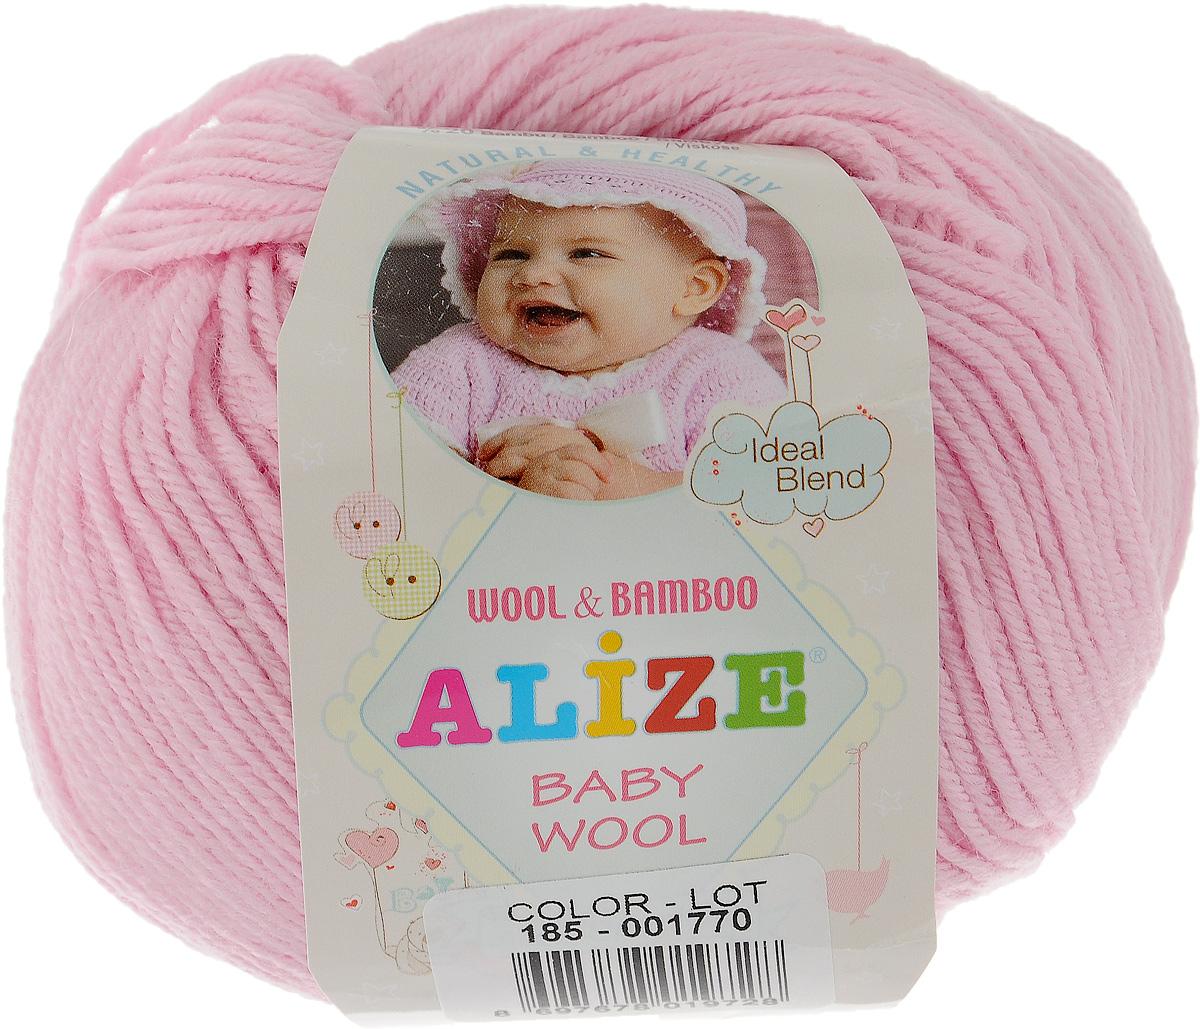 Пряжа Baby wool 50 г, 165 м. (20% бамбук, 40% шерсть, 40% акрил)ТУ. 686501_185686501_18520%бамбук, 40%шерсть, 40%акрил